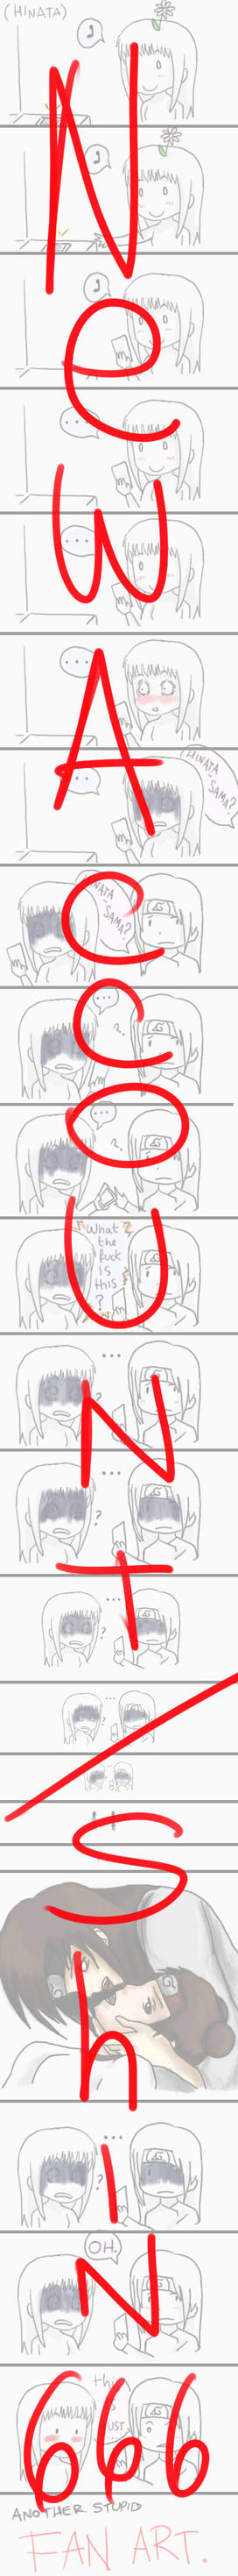 Fan art by SillyVacant